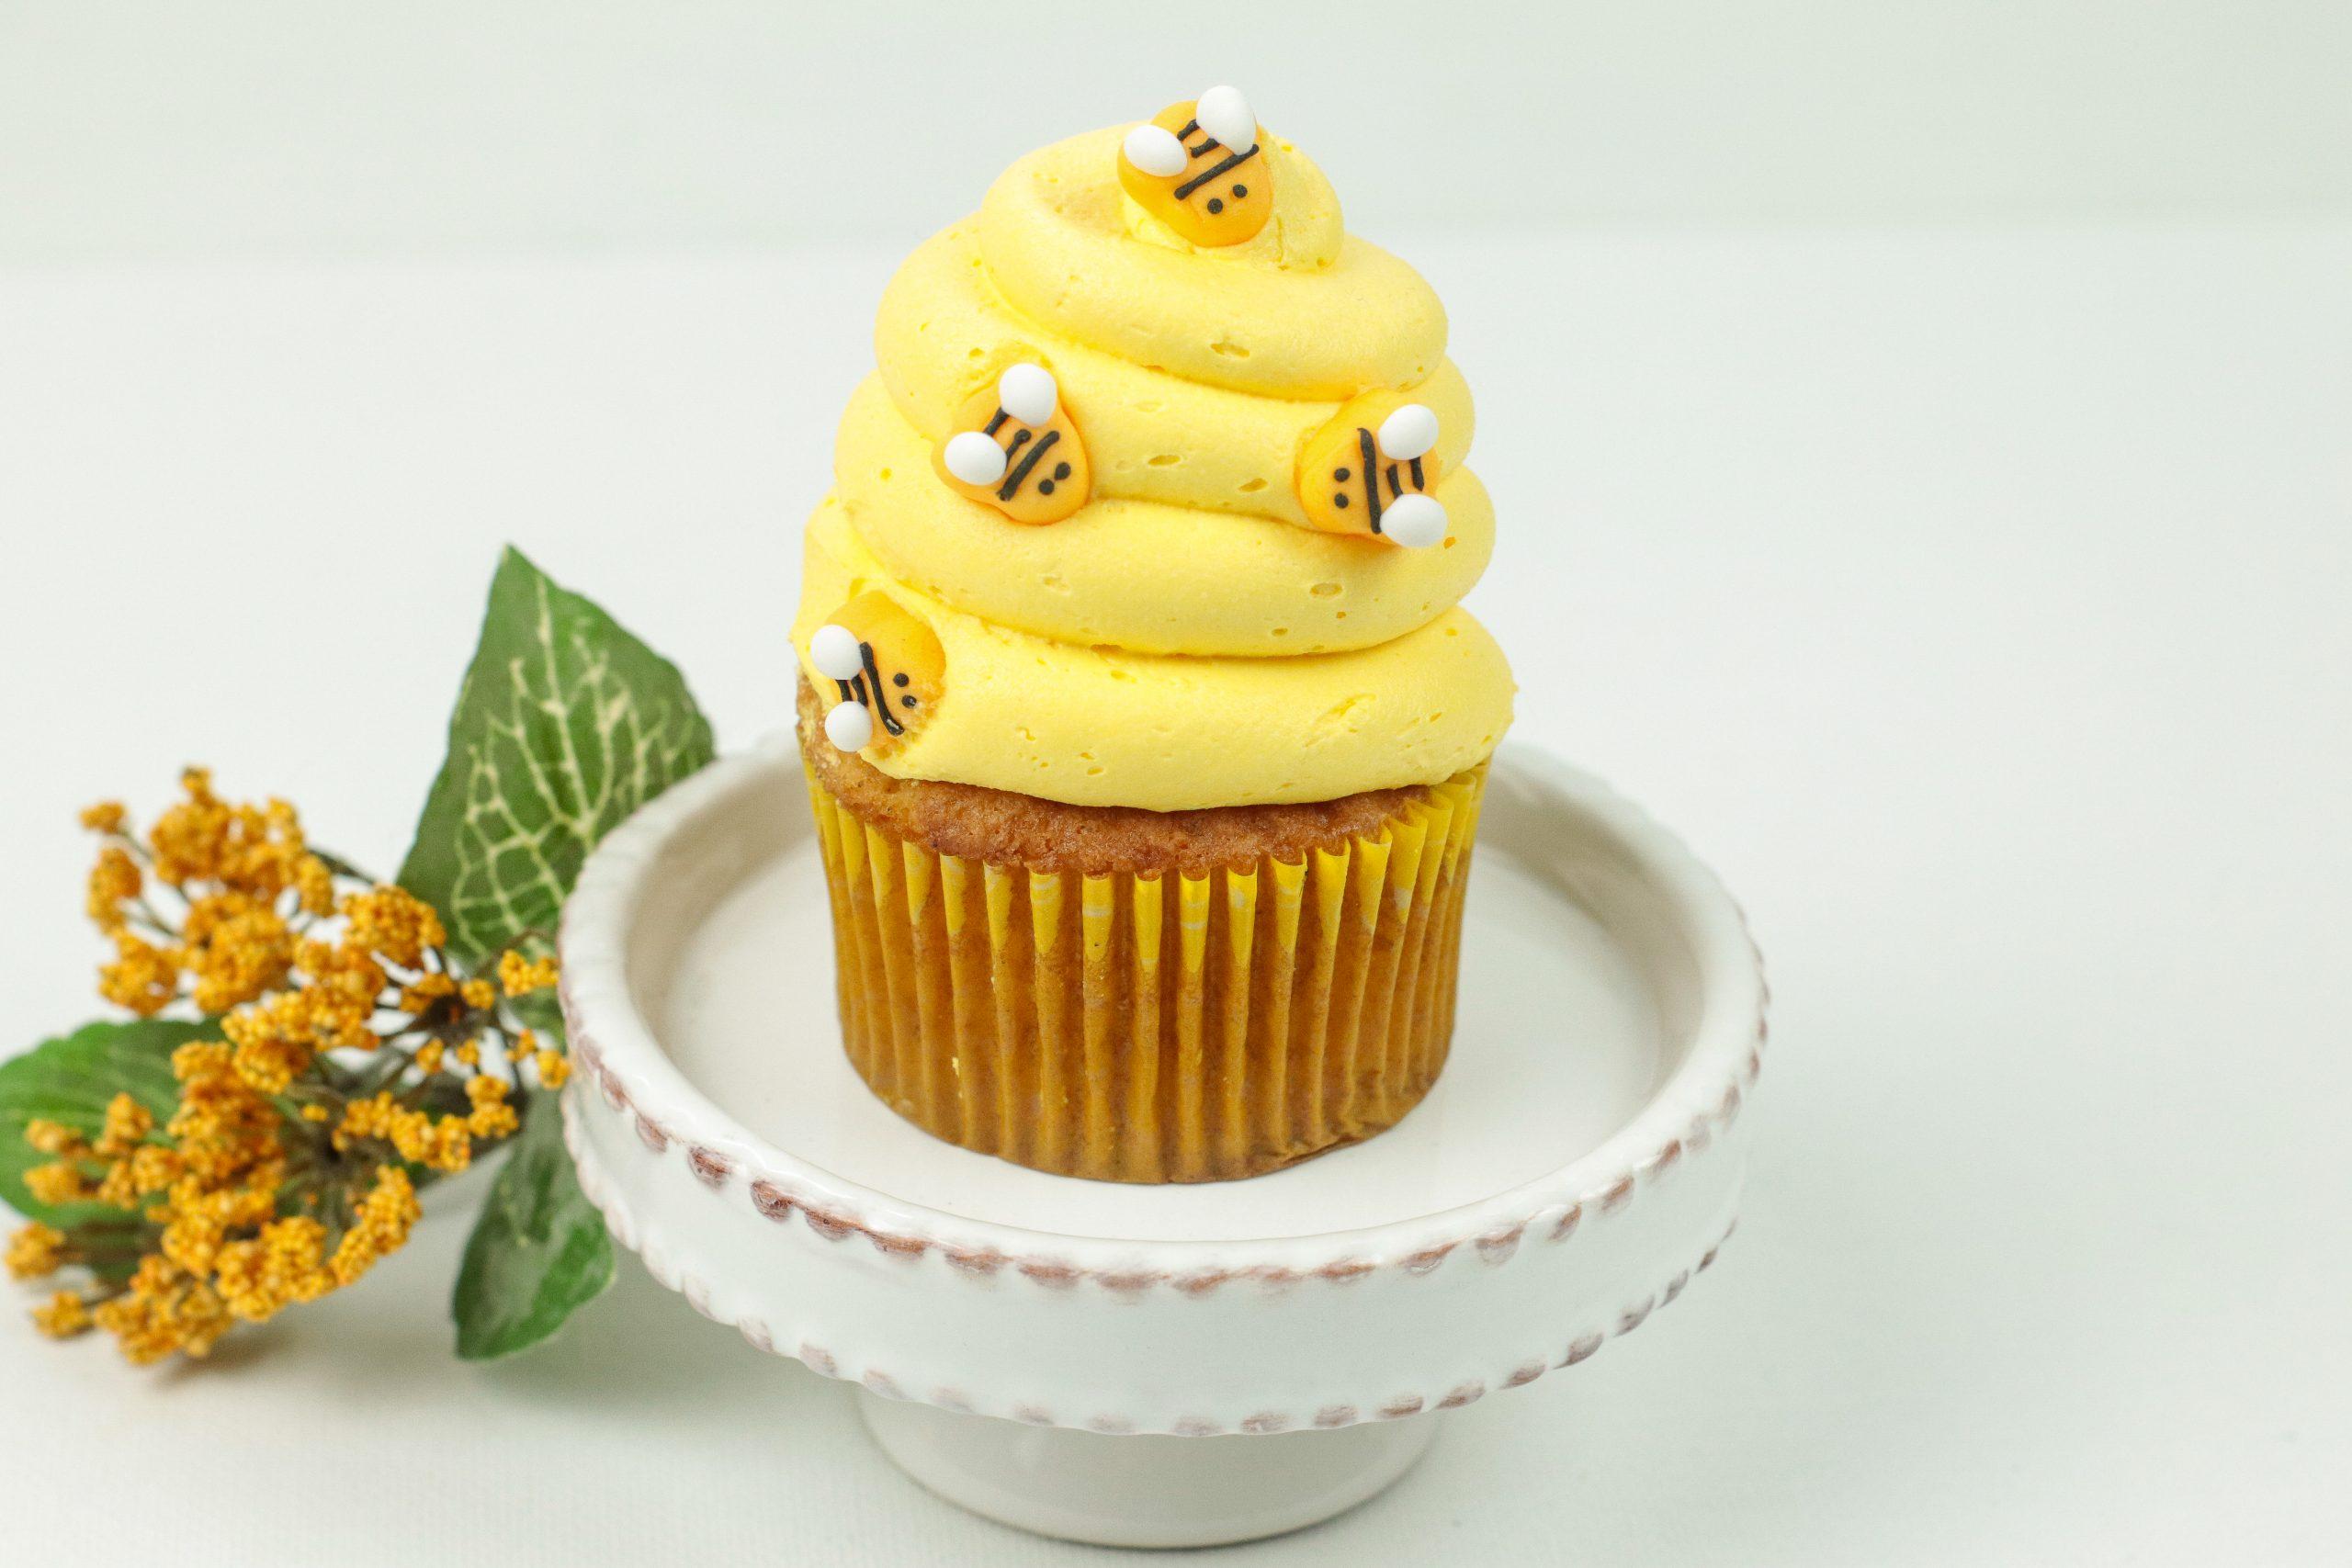 Honey Cinnamon Bumblebee Cupcakes on a serving dish.